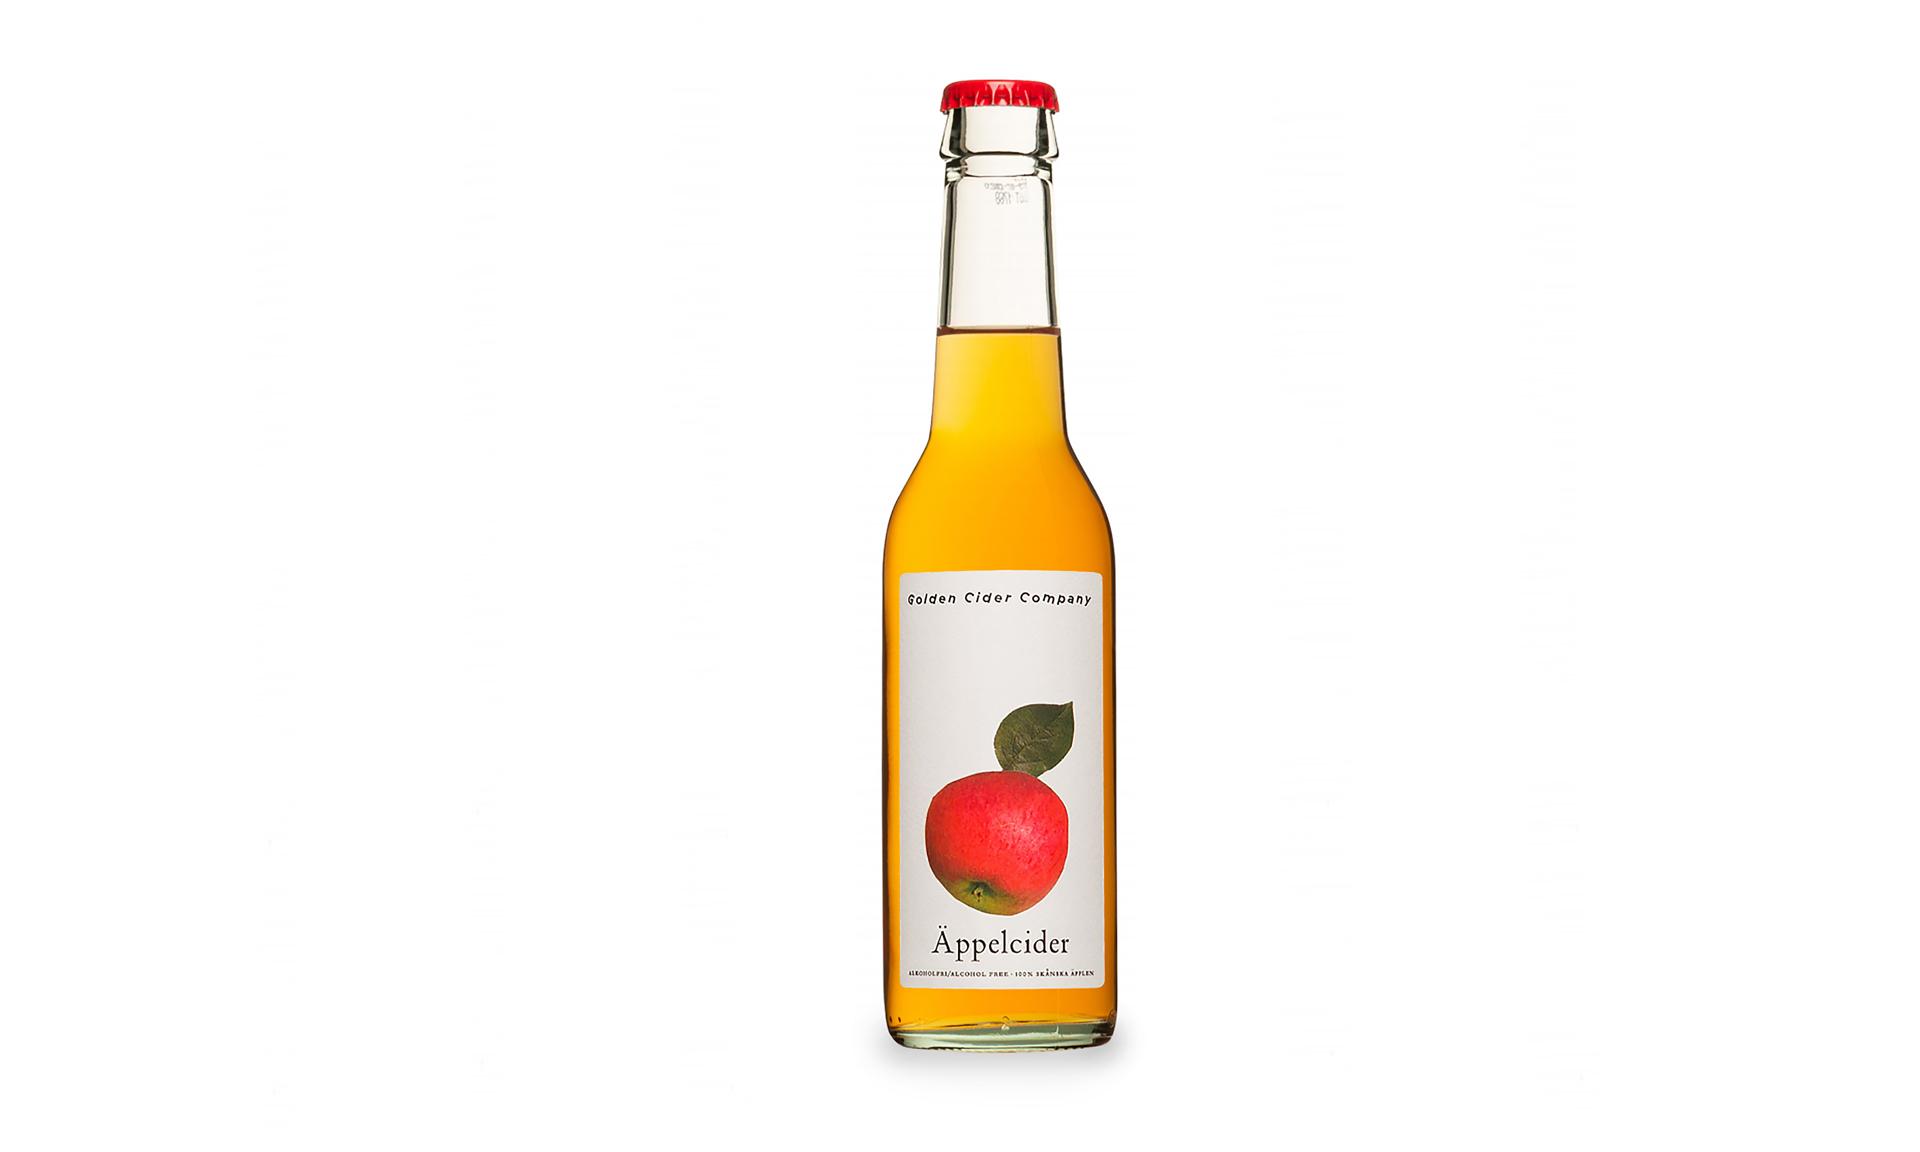 Golden Cider Company Äppelcider